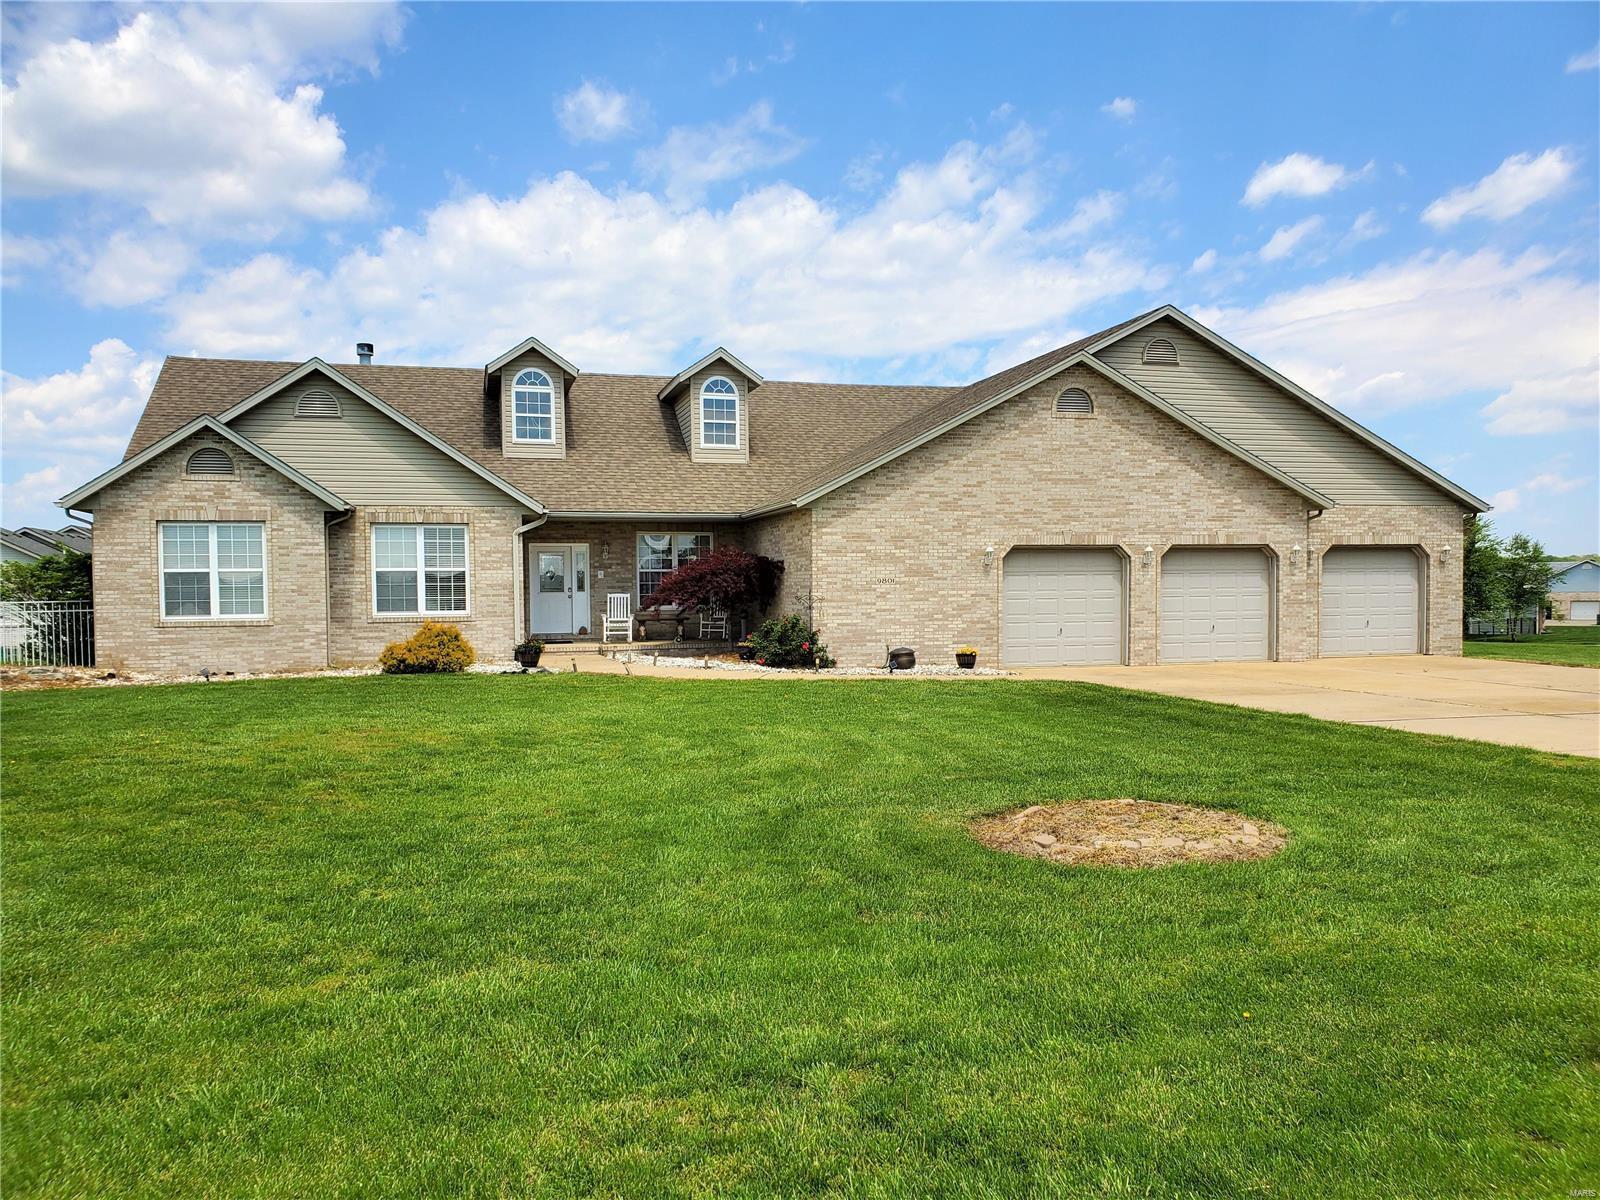 9801 BEACON Street Property Photo - St Jacob, IL real estate listing